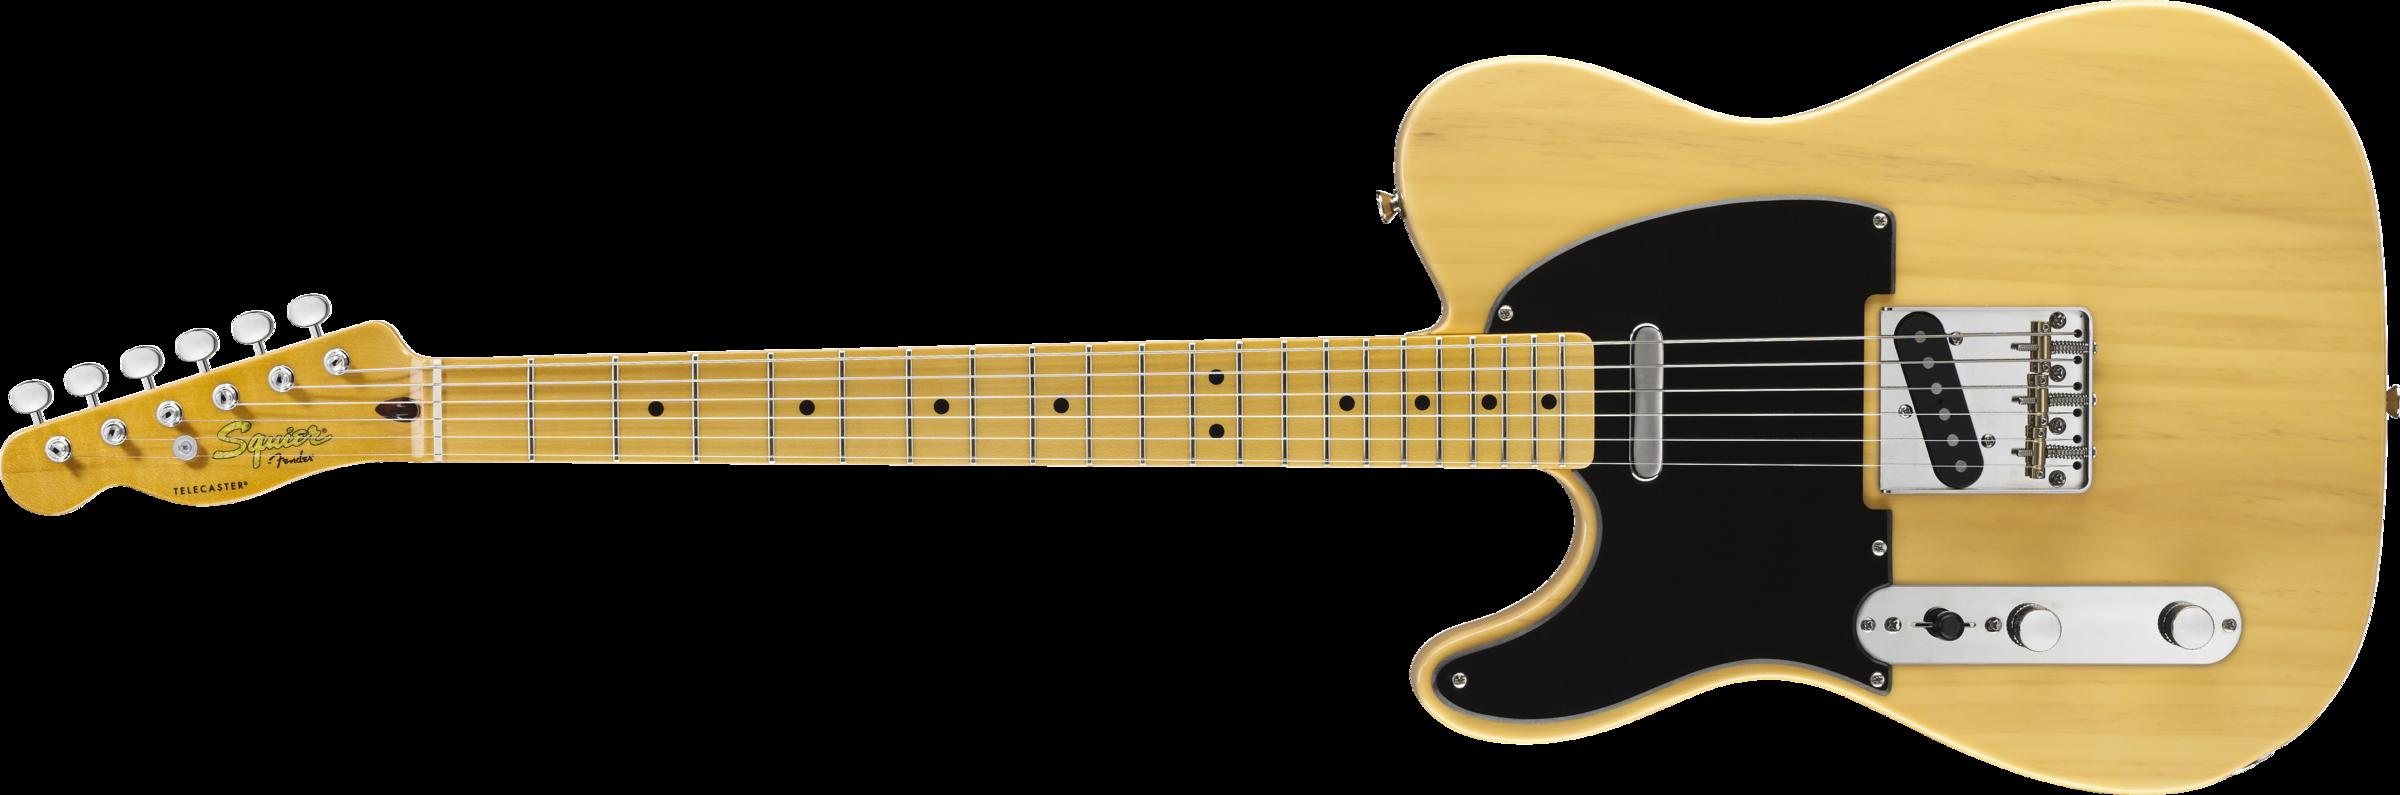 guitare electrique gaucher fender